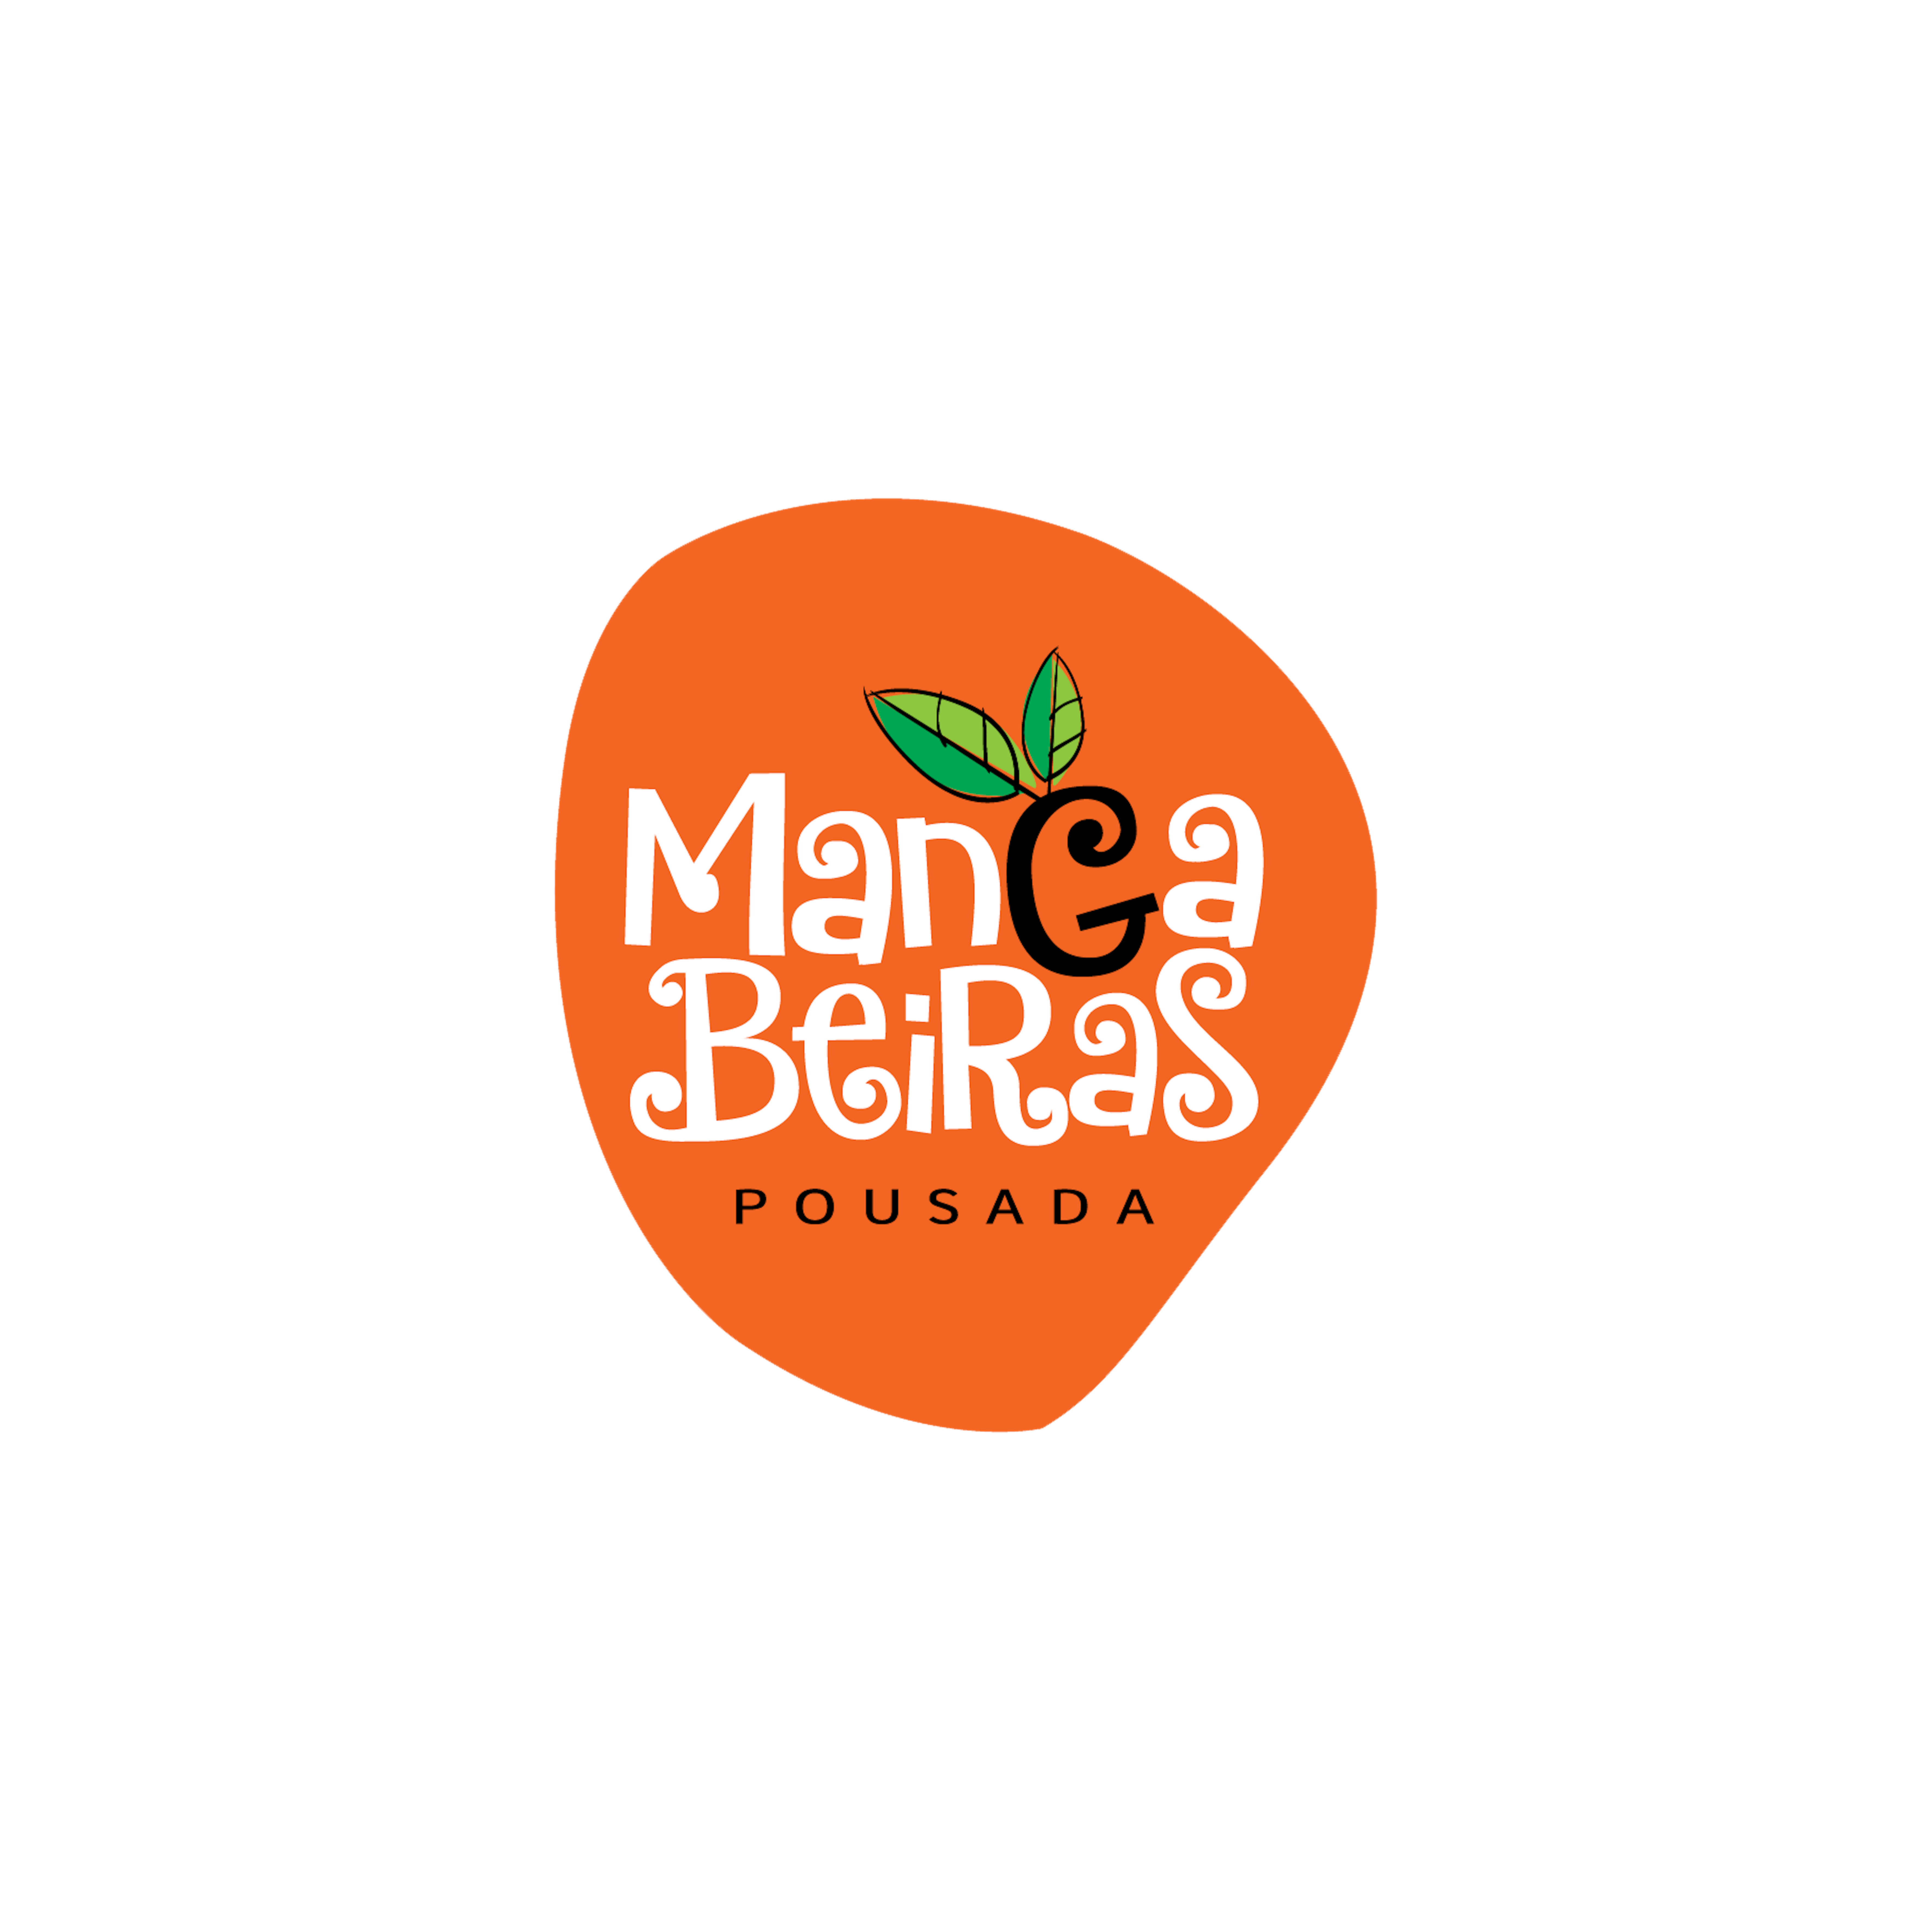 Pousada Mangabeiras